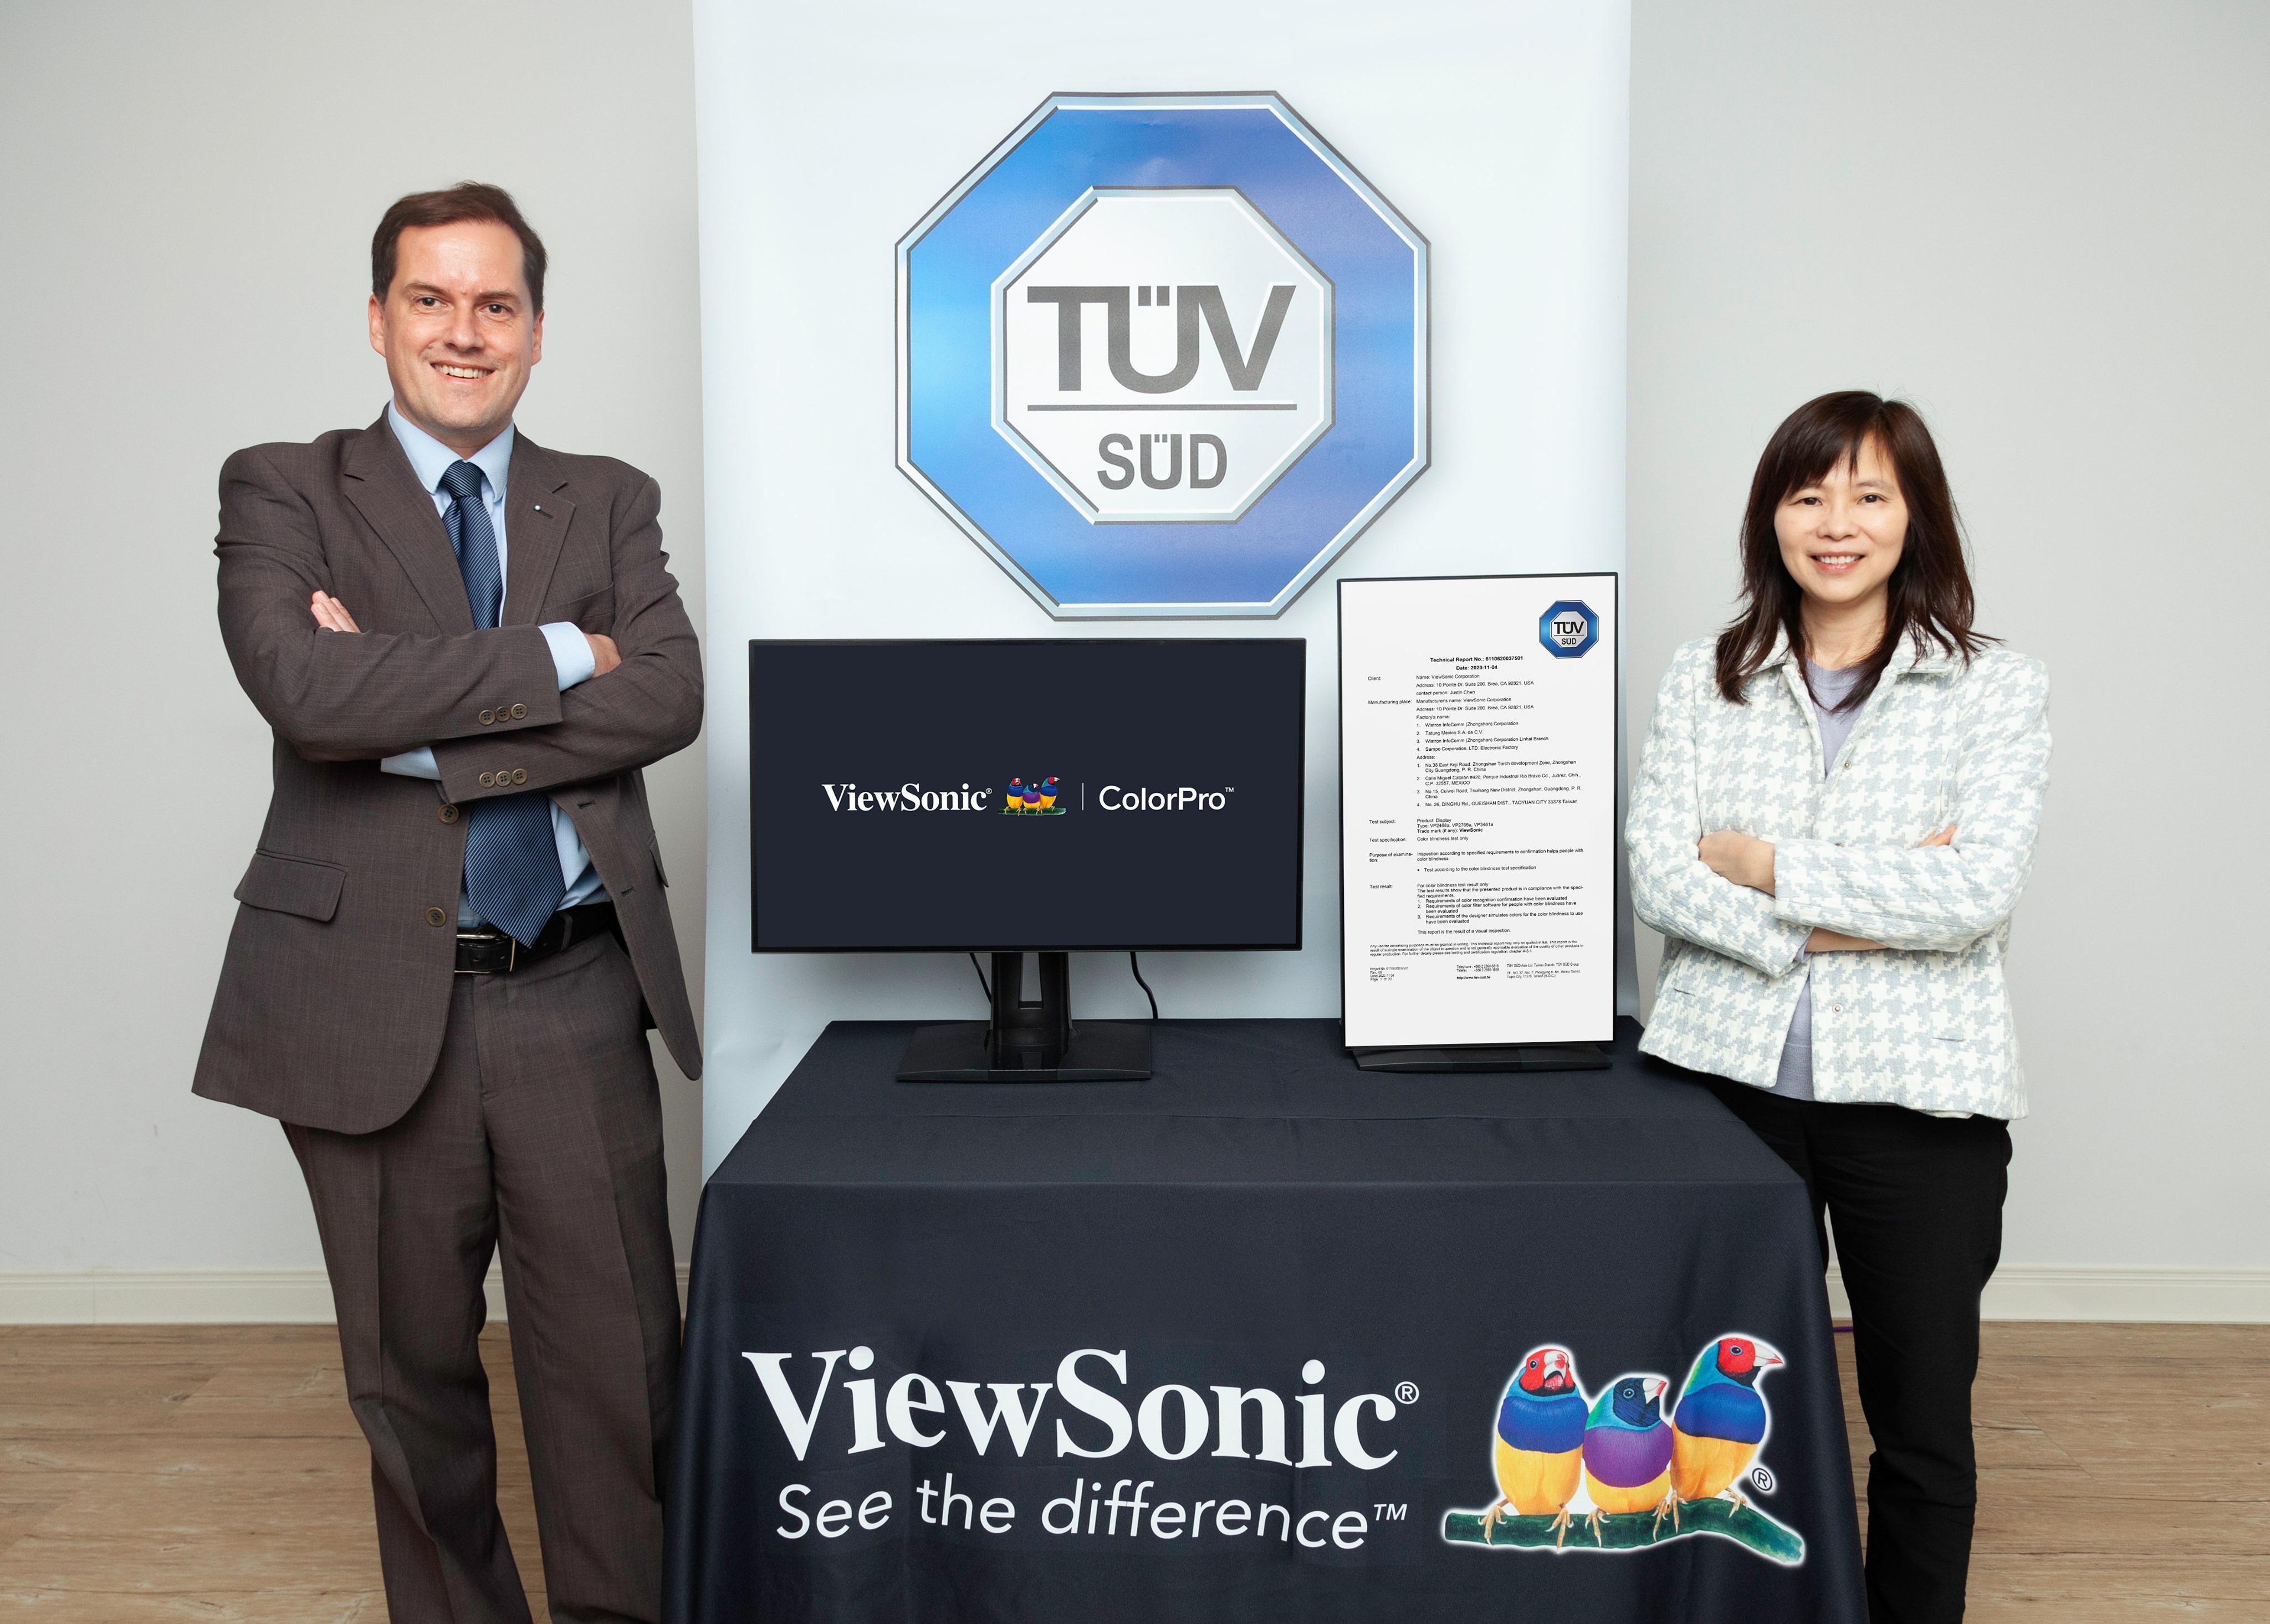 News Photo_ViewSonic TUV SUD partnership